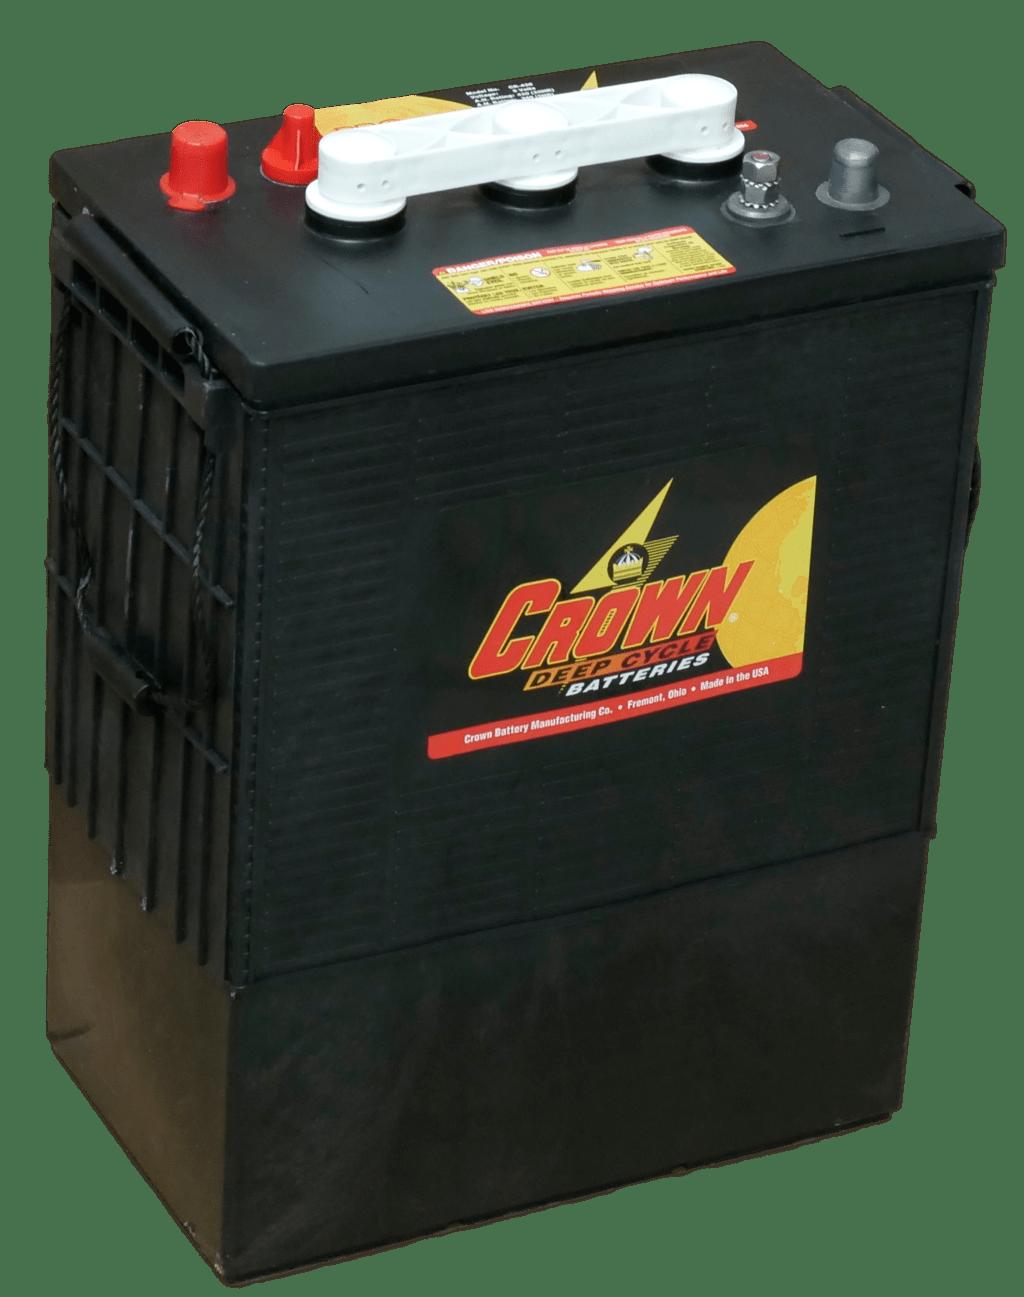 Crown 430 AH 24VDC 10,320 Wh (4) Battery Bank